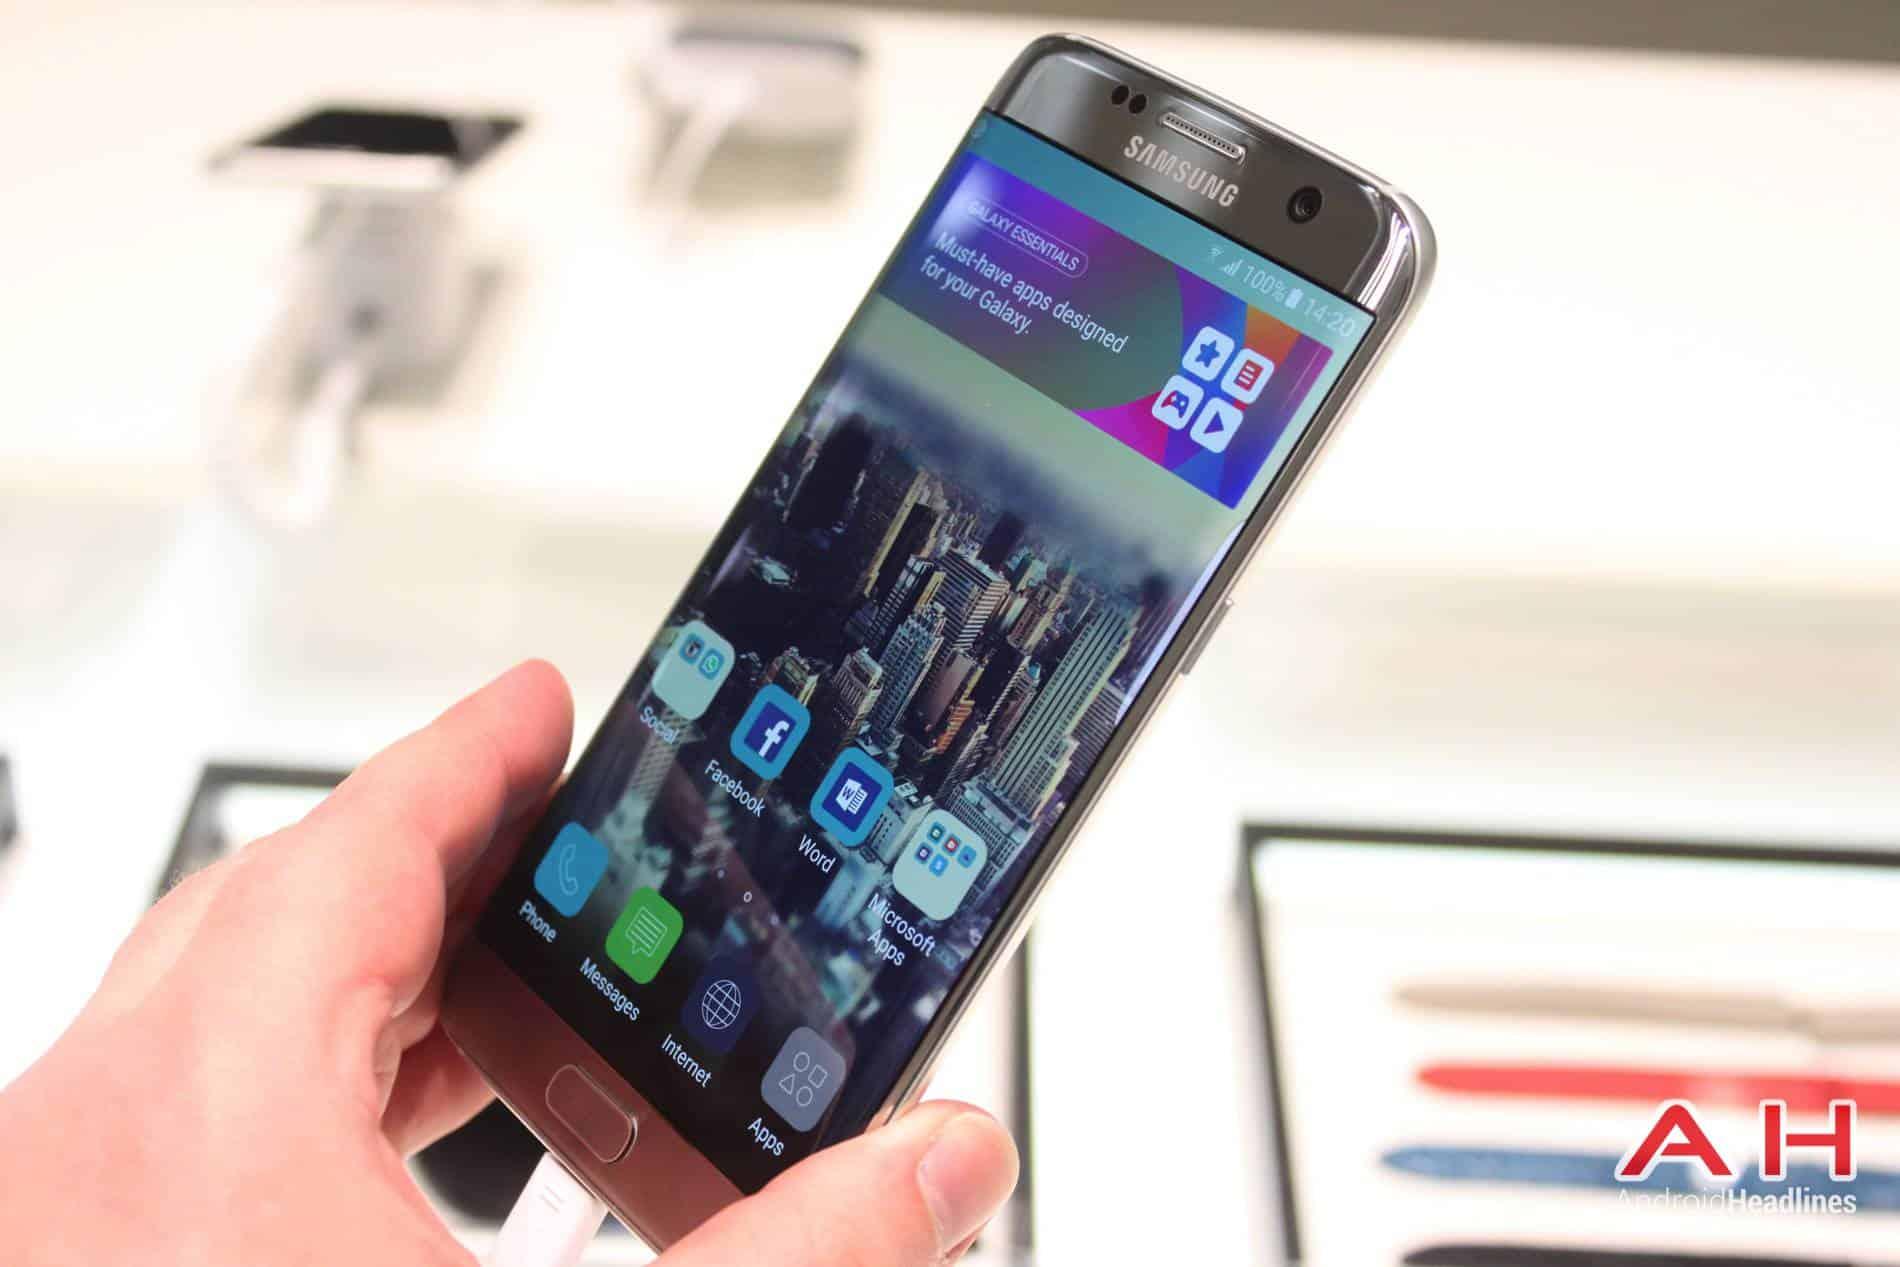 Galaxy S7 Edge MWC Booth AH 5